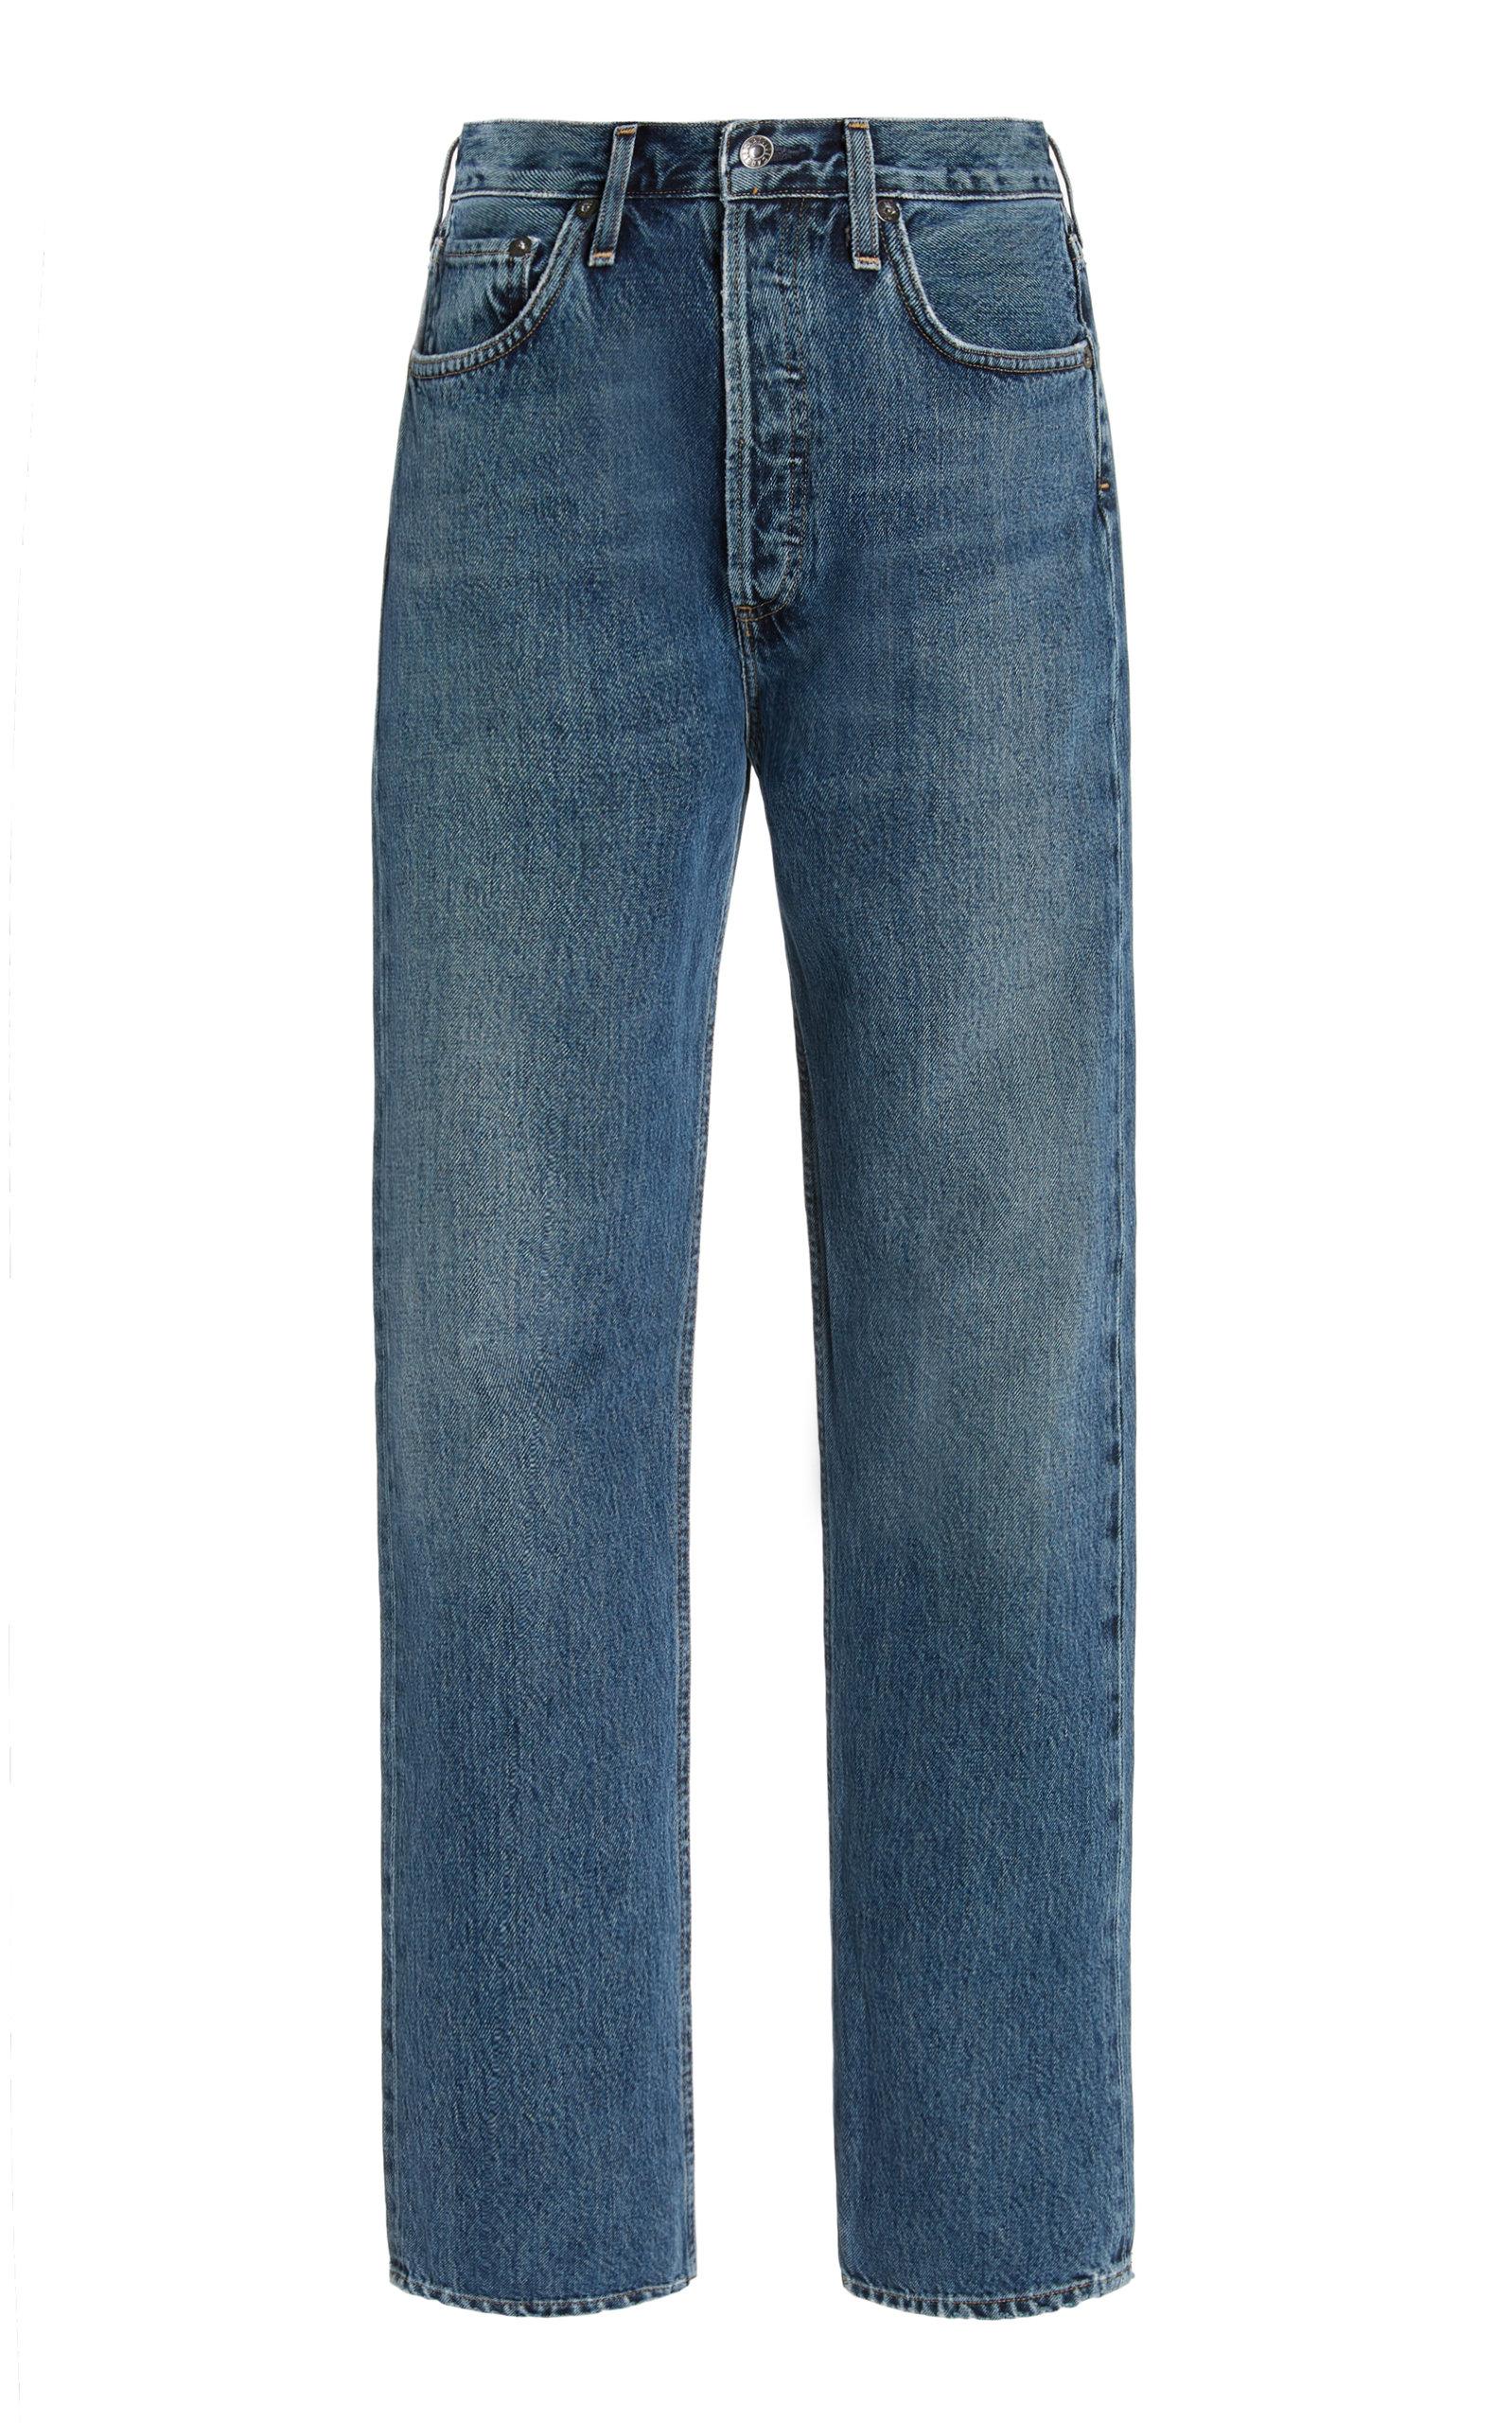 Agolde - Women's 90's Pinch-Waist Rigid High-Rise Organic Cotton Straight-Leg Jeans - Dark Wash - Moda Operandi